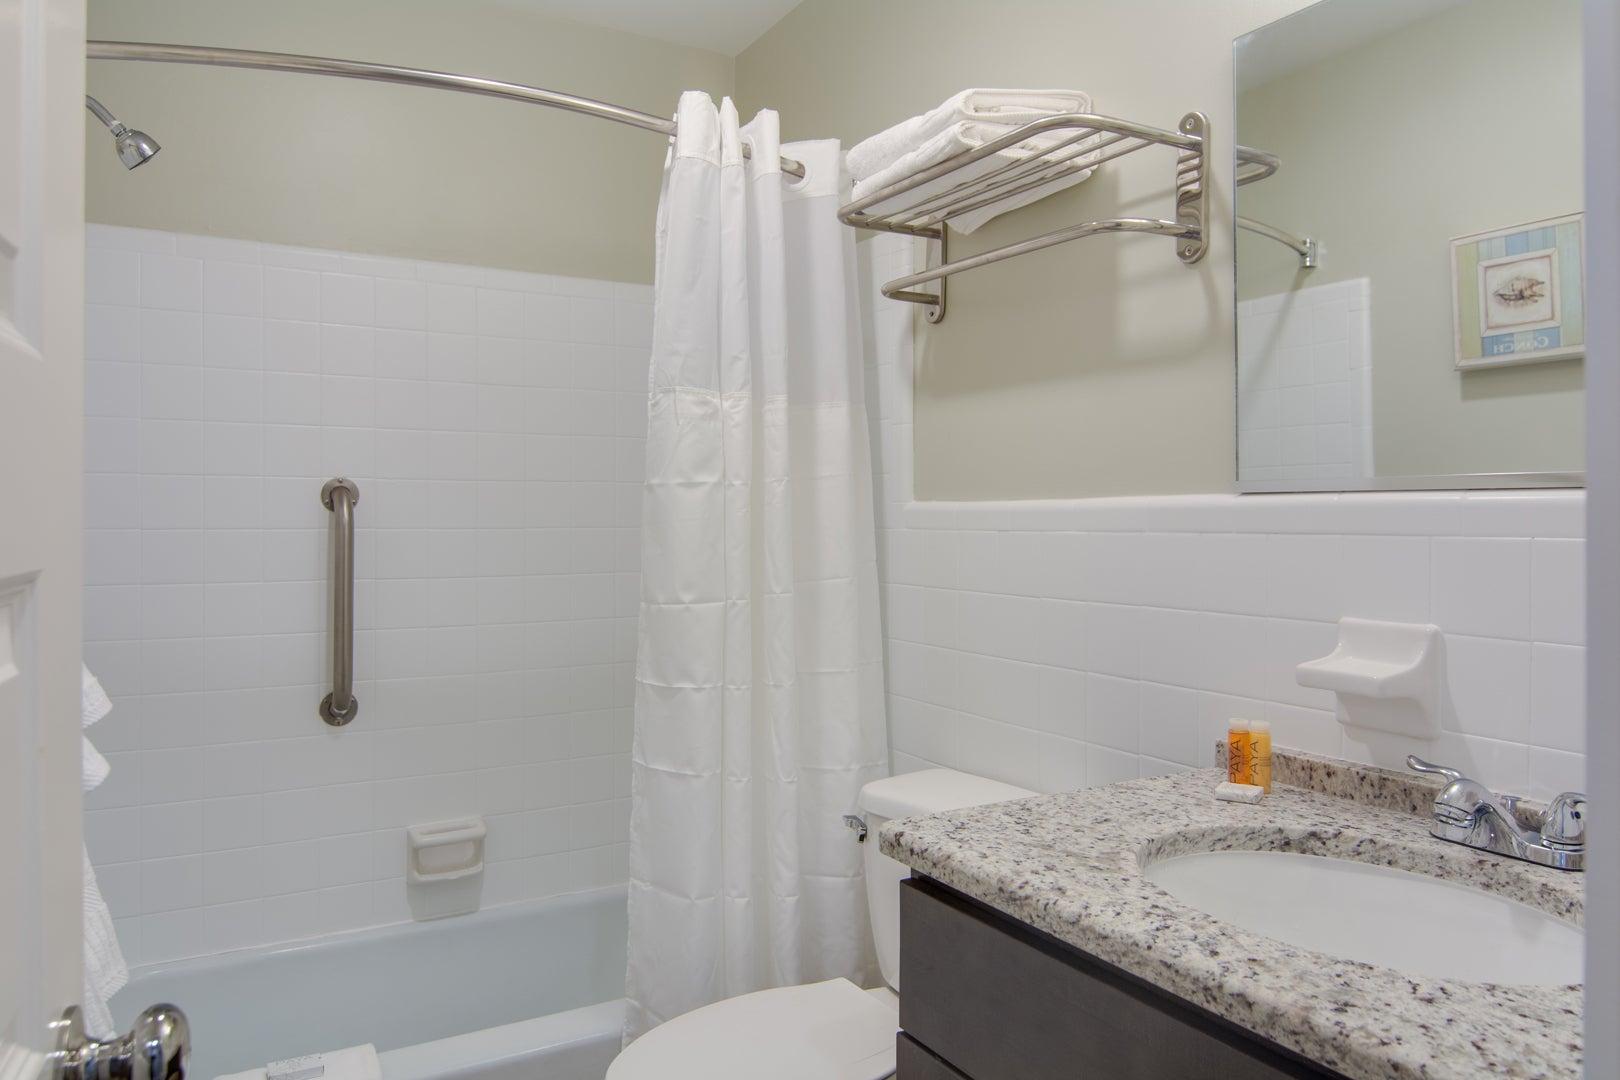 TH23:  The Pamlico Sound Room   Private Bath